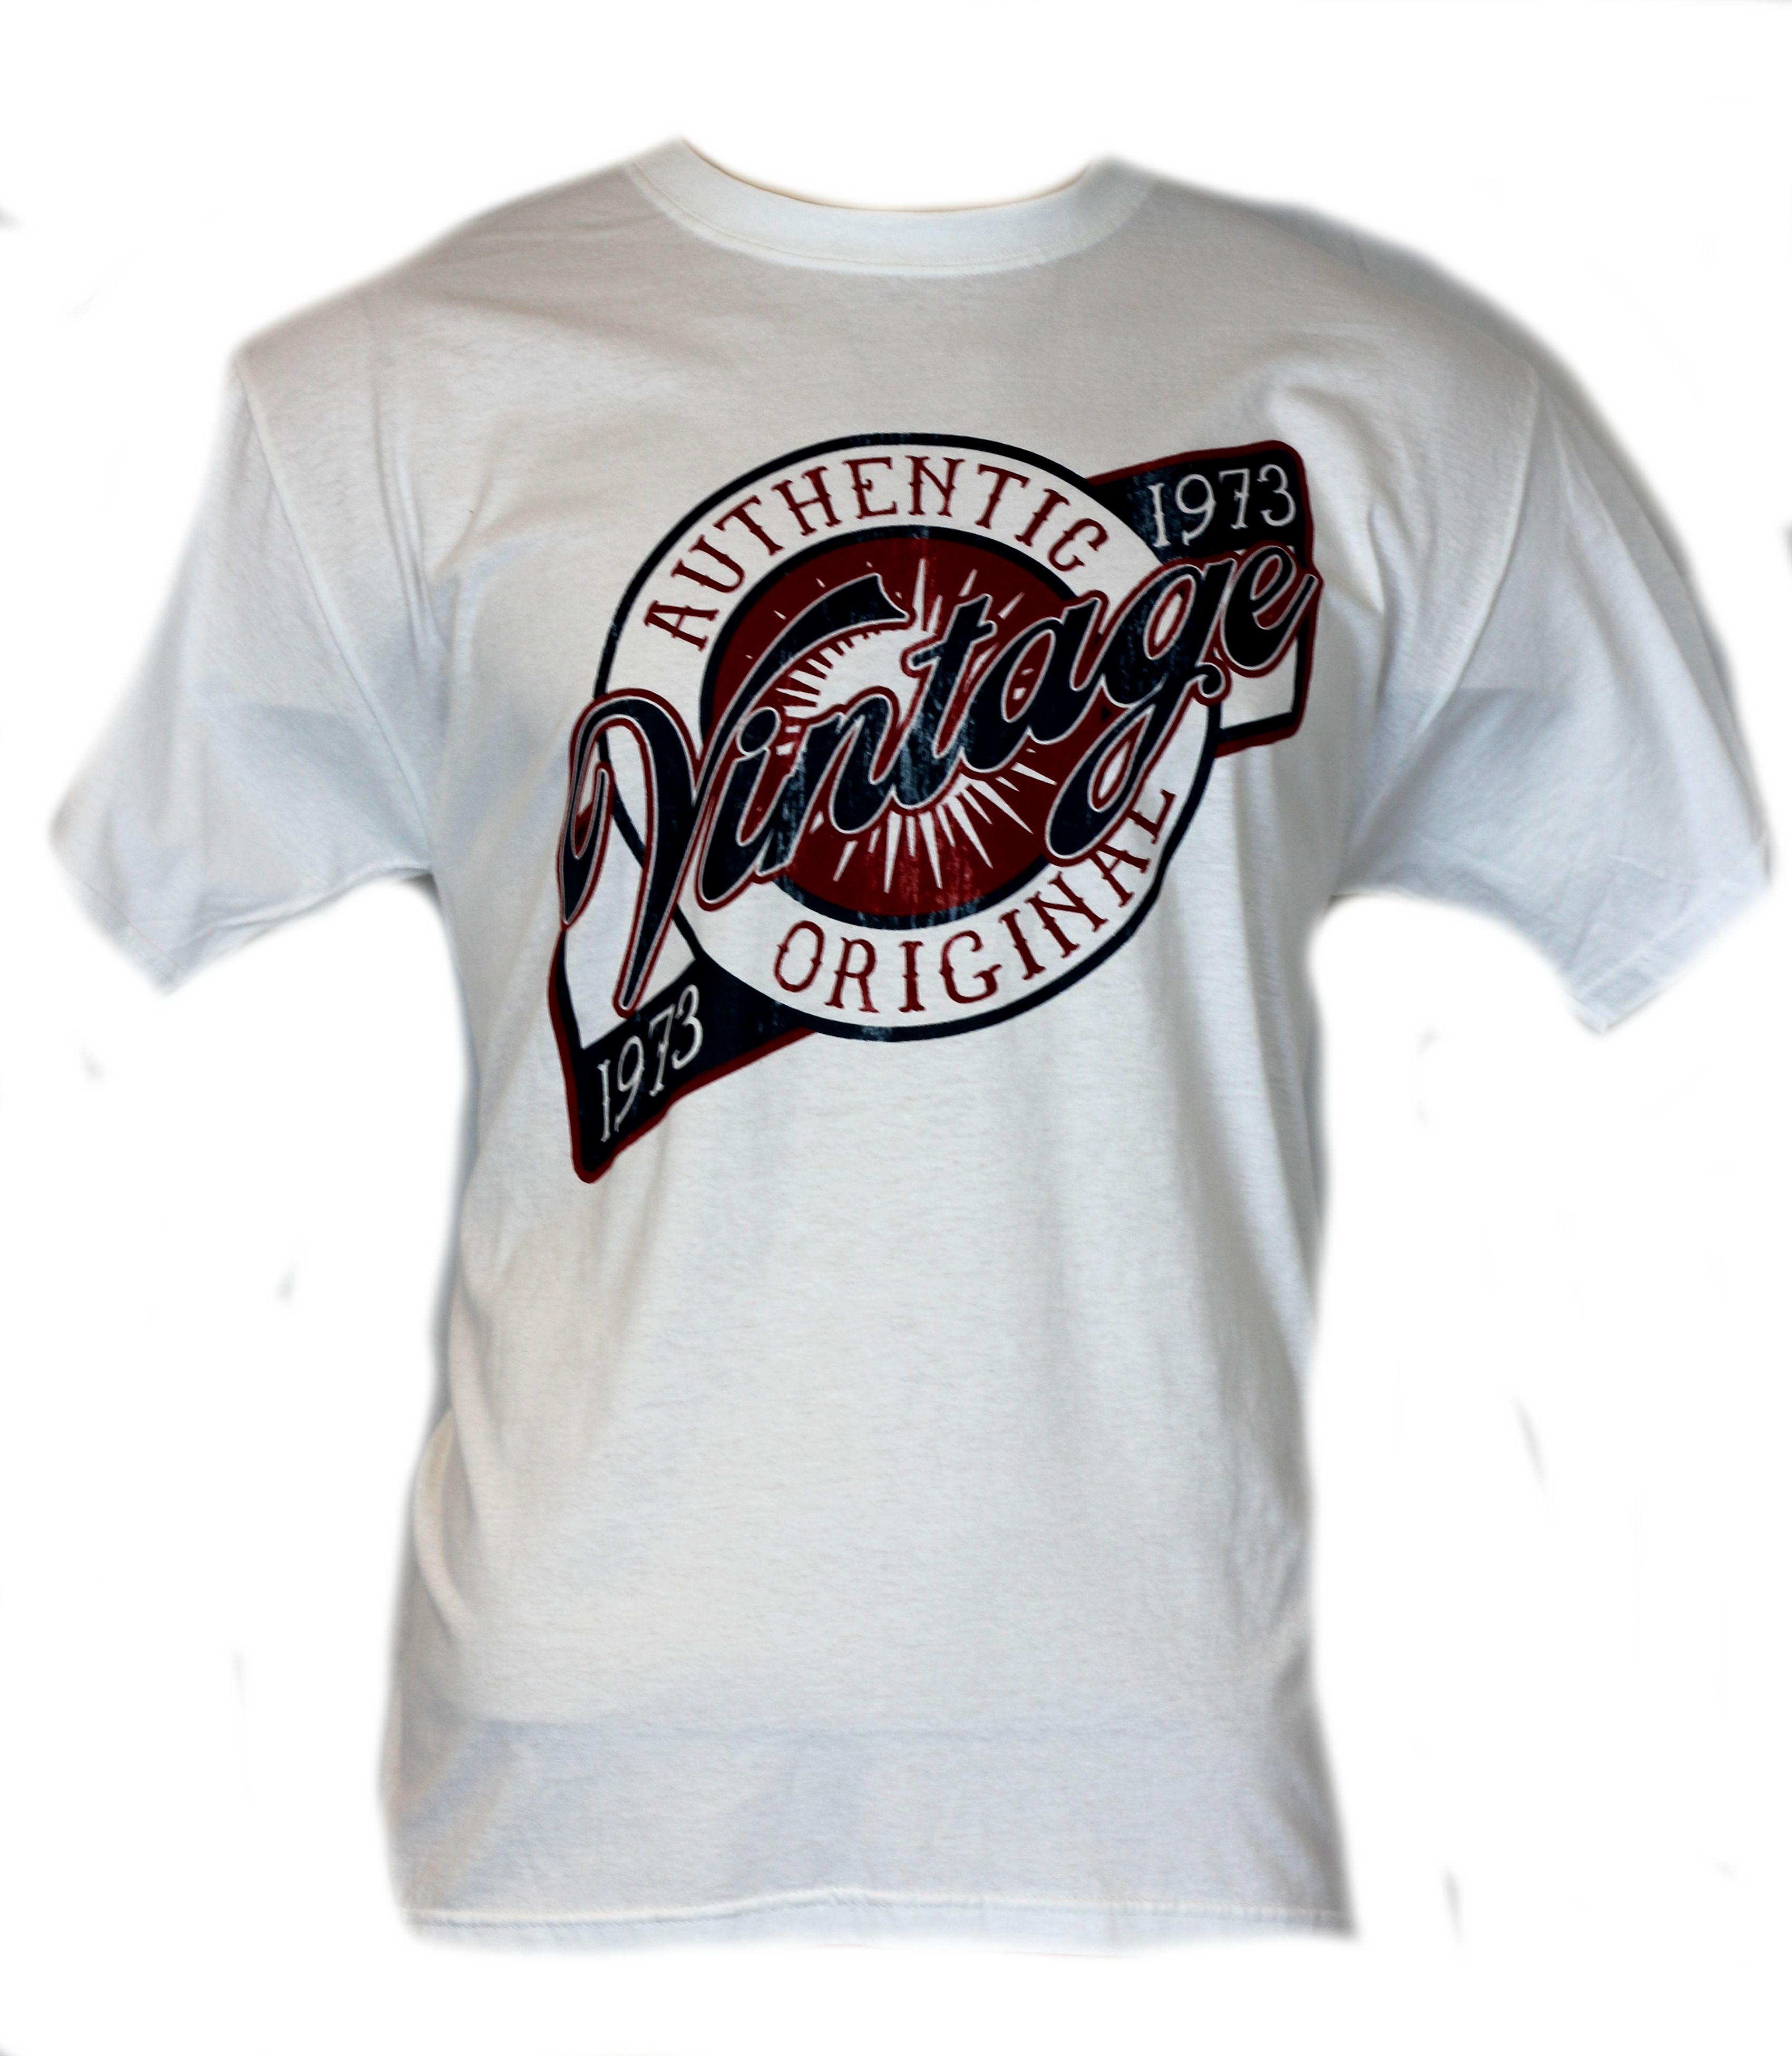 authentic vintage mens t shirt birthday 1973 shirt